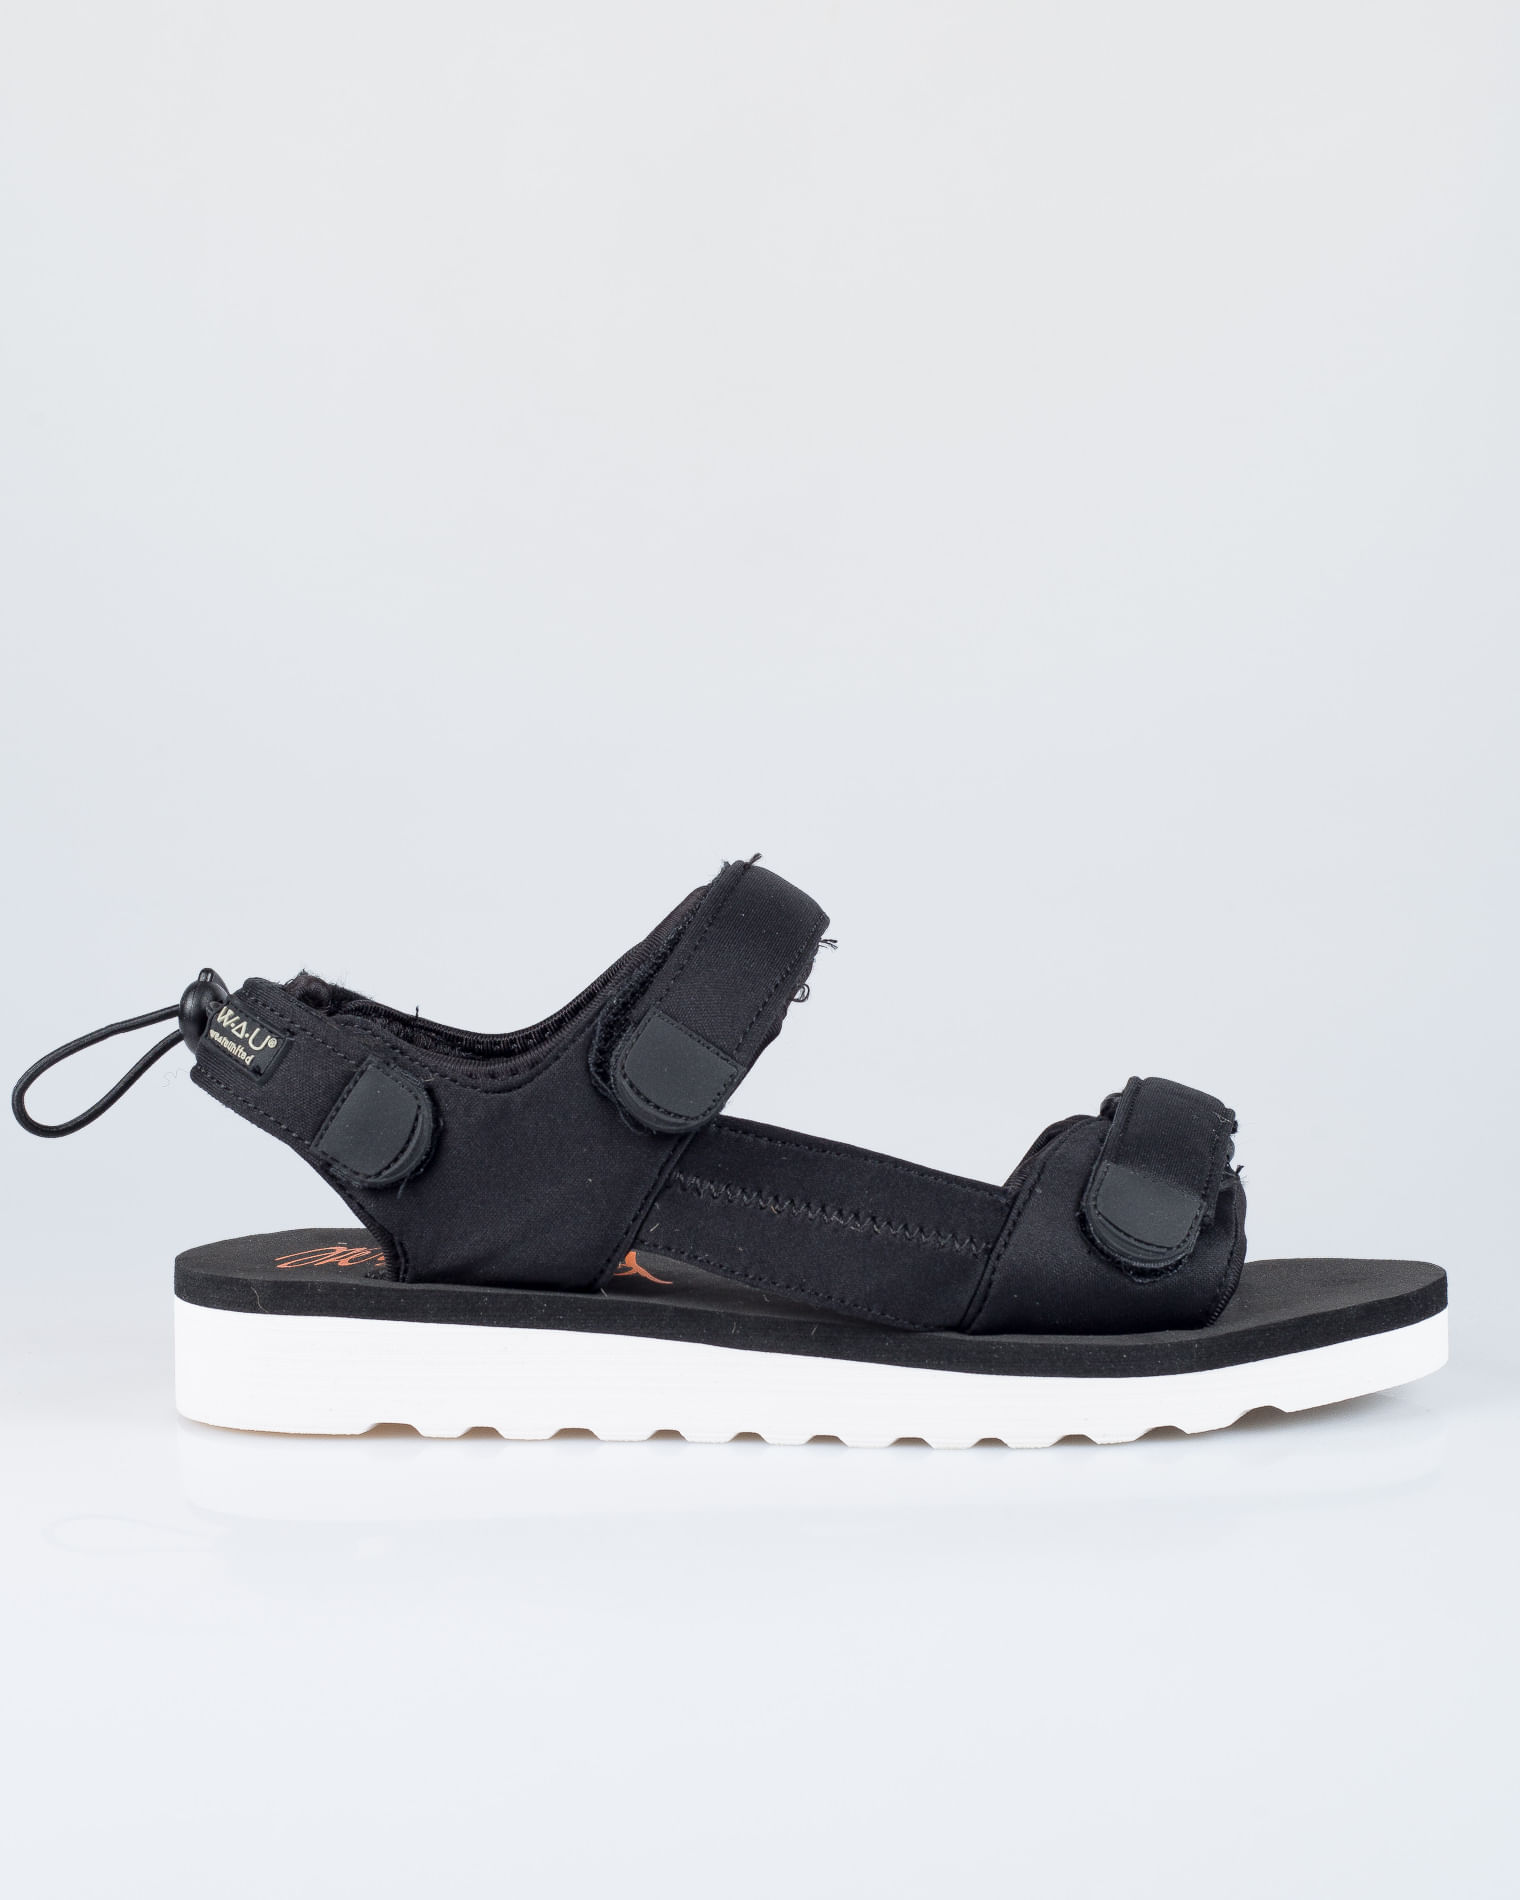 Sandale Brisma cu inchidere pe scai - Miniprix 39c485233e6